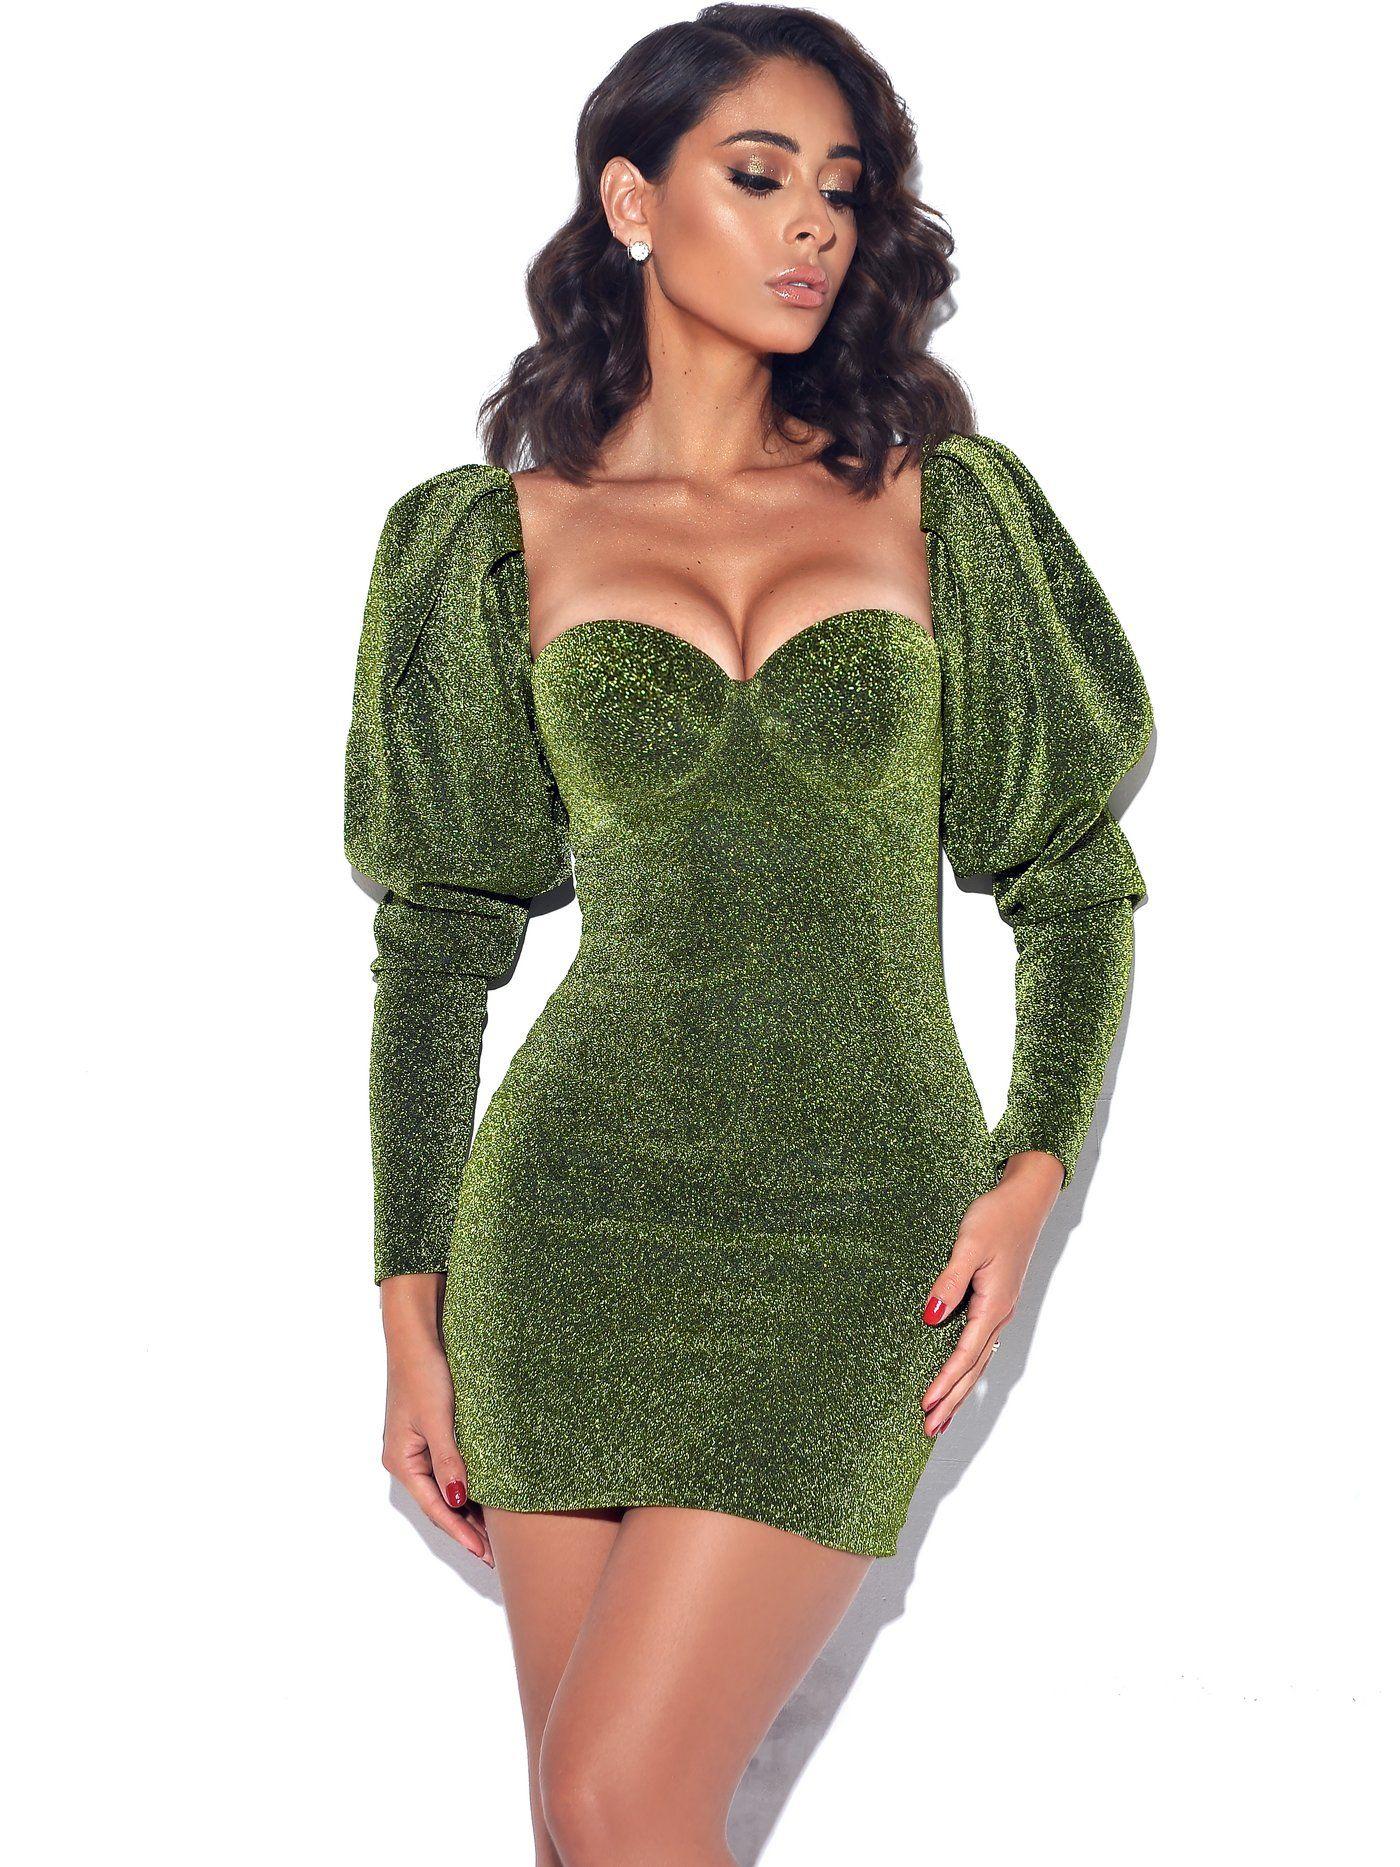 Verina Green Metallic Puff Shoulder Dress Long Sleeve Mini Dress Bodycon Dress Bodycon Mini Dress [ 1867 x 1400 Pixel ]